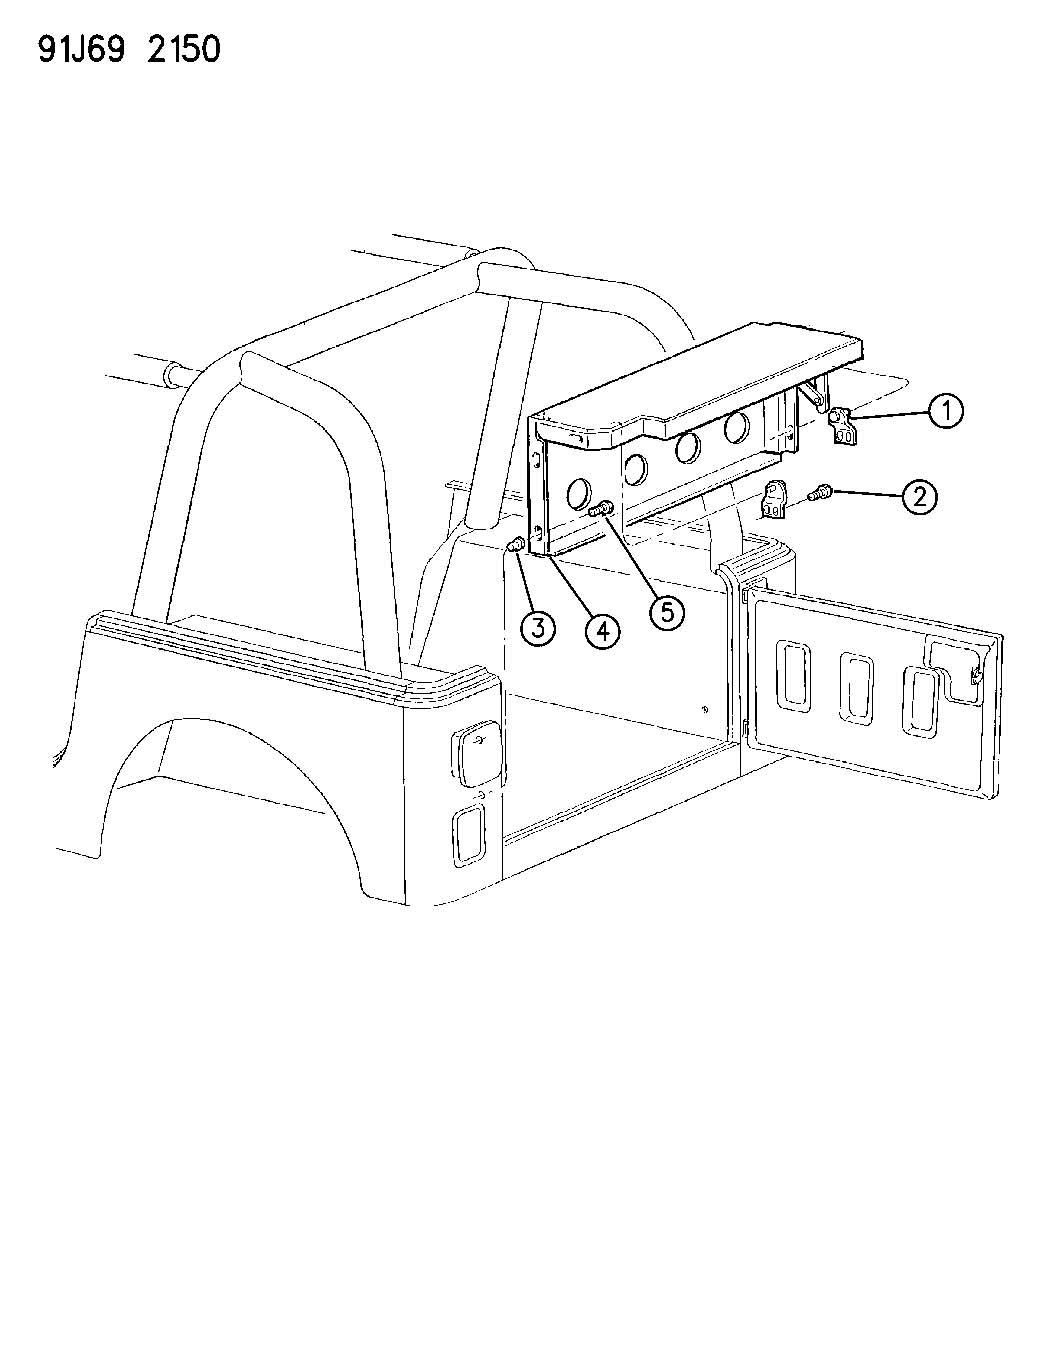 1988 Jeep Cherokee Nut  Rivet  Round  M6 00 X 1 00 X 15 00